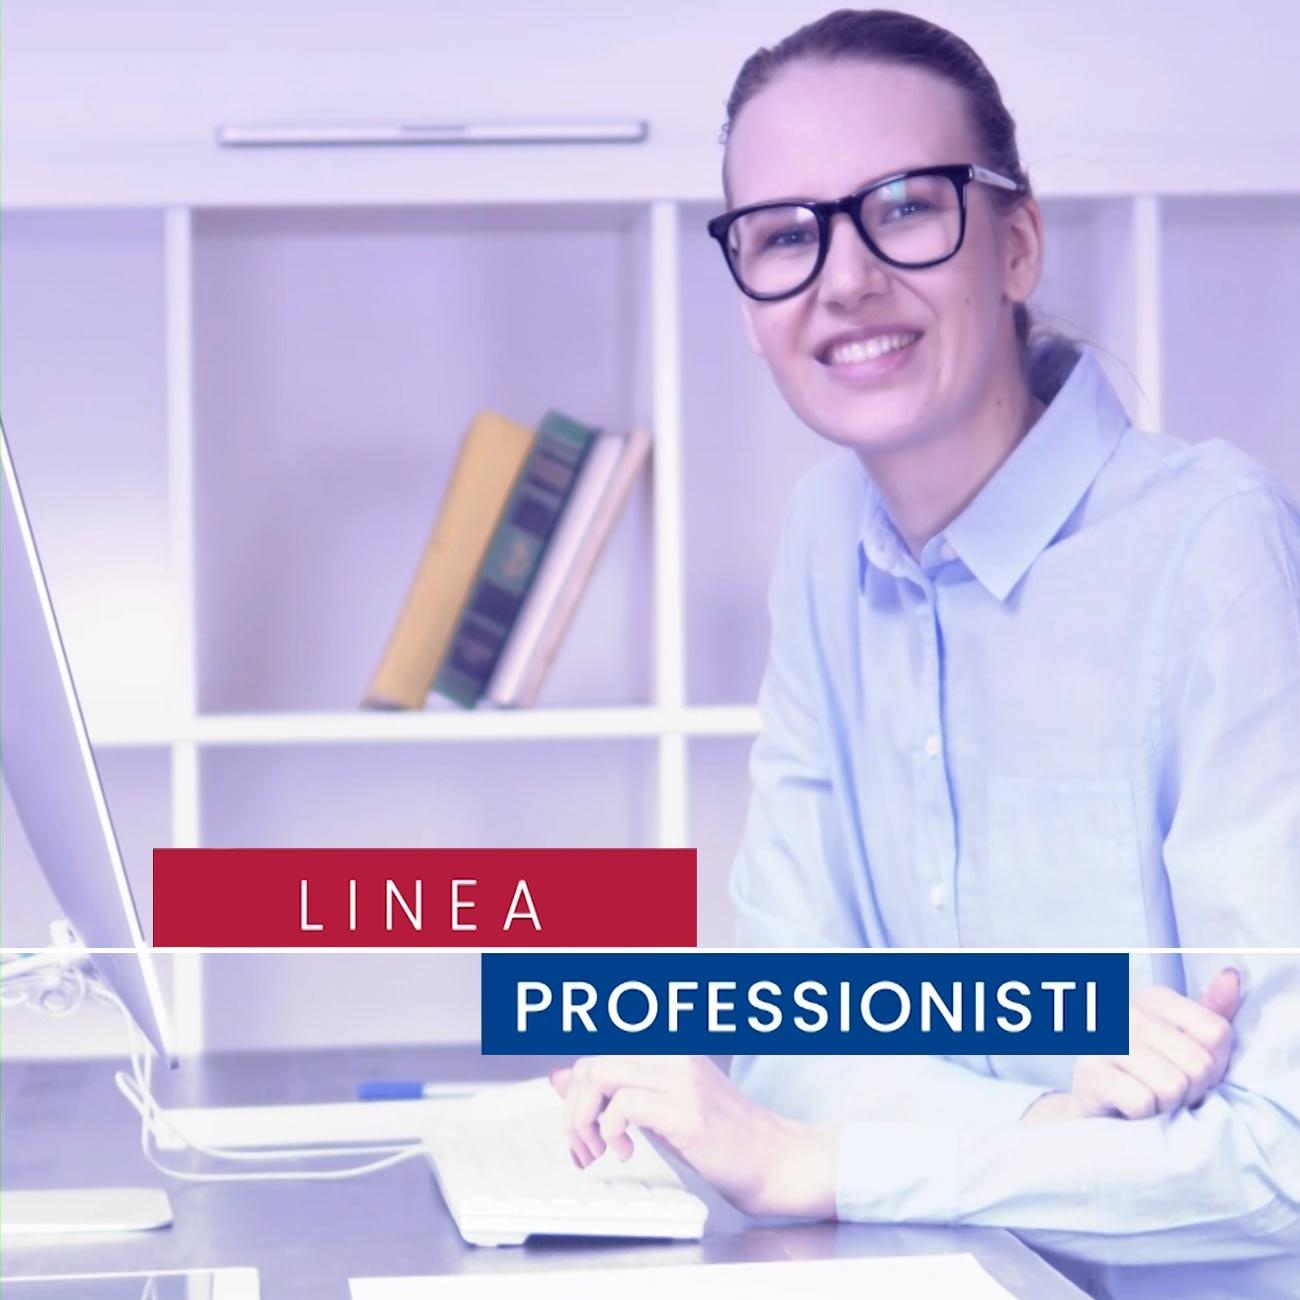 Linea professionisti